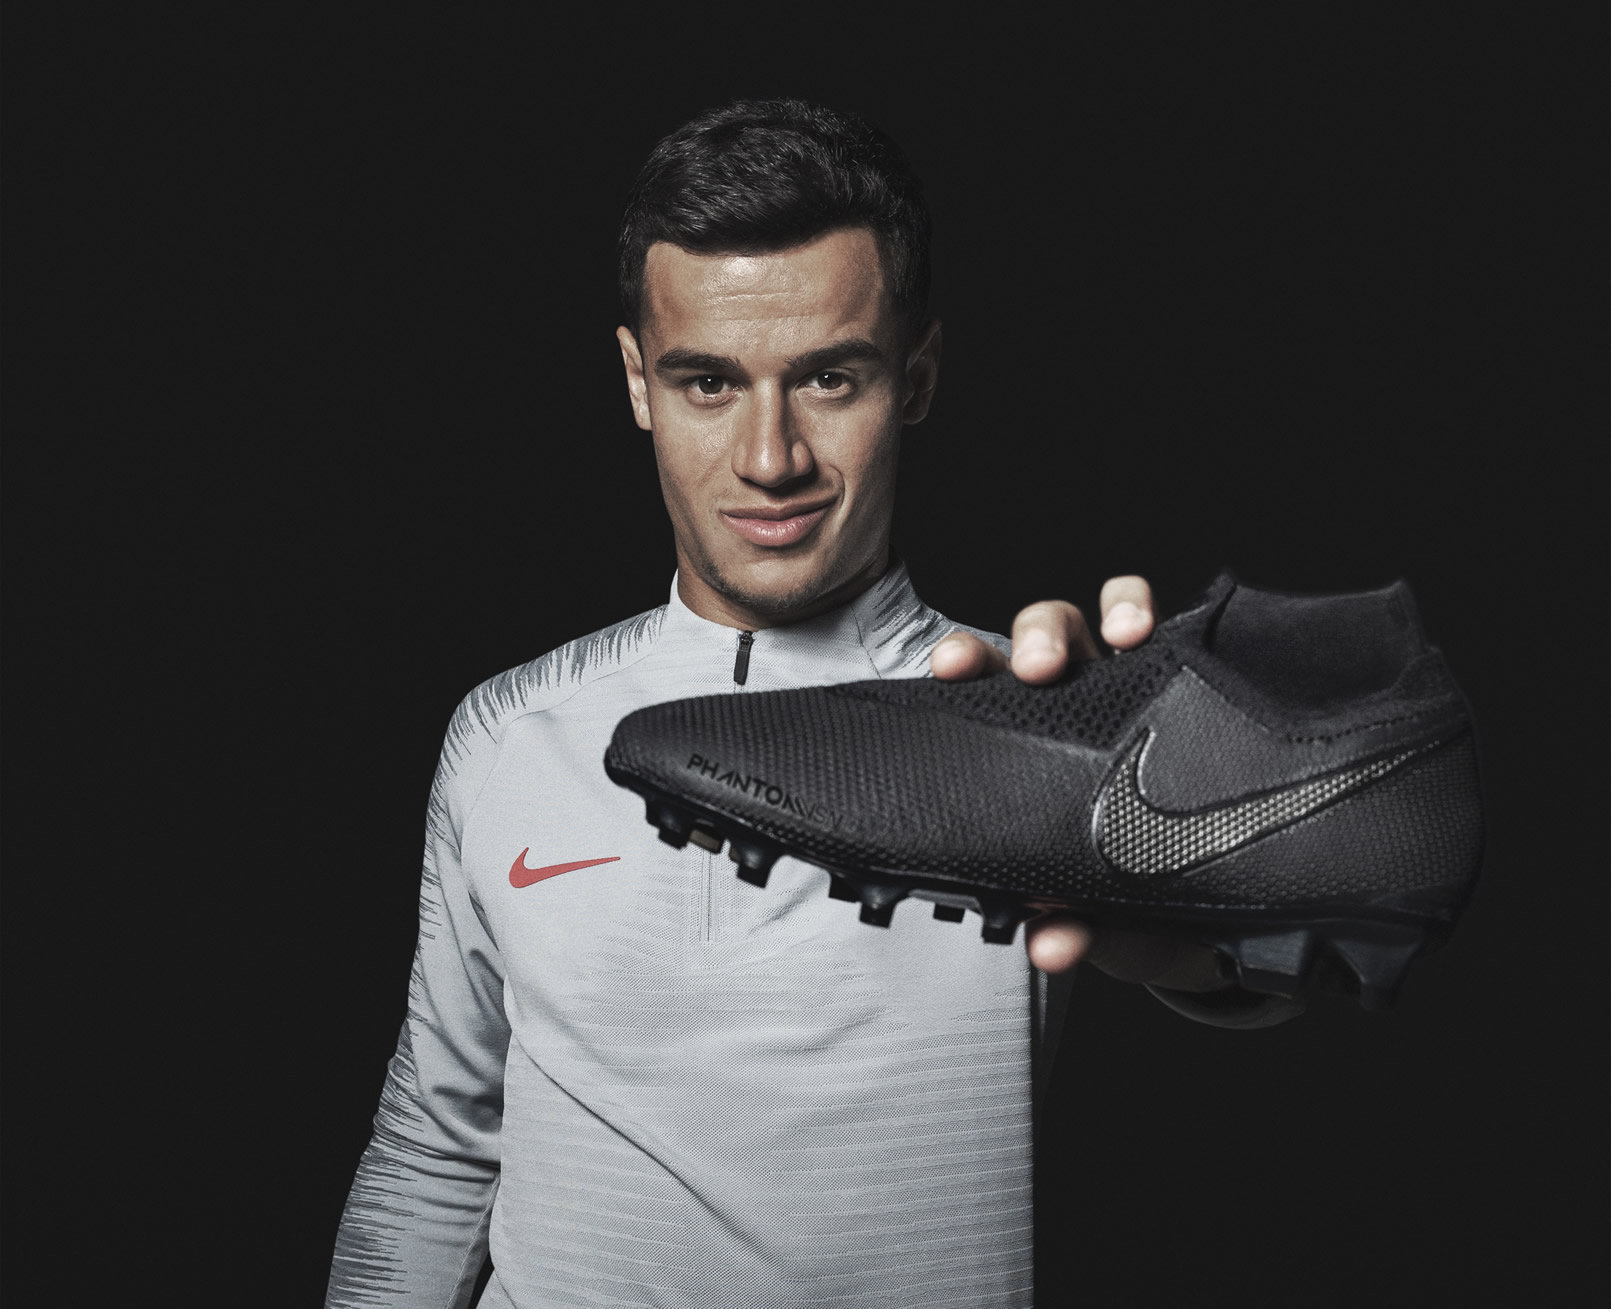 Philippe Couthino con los nuevos botines PhantomVsn | Imagen Nike